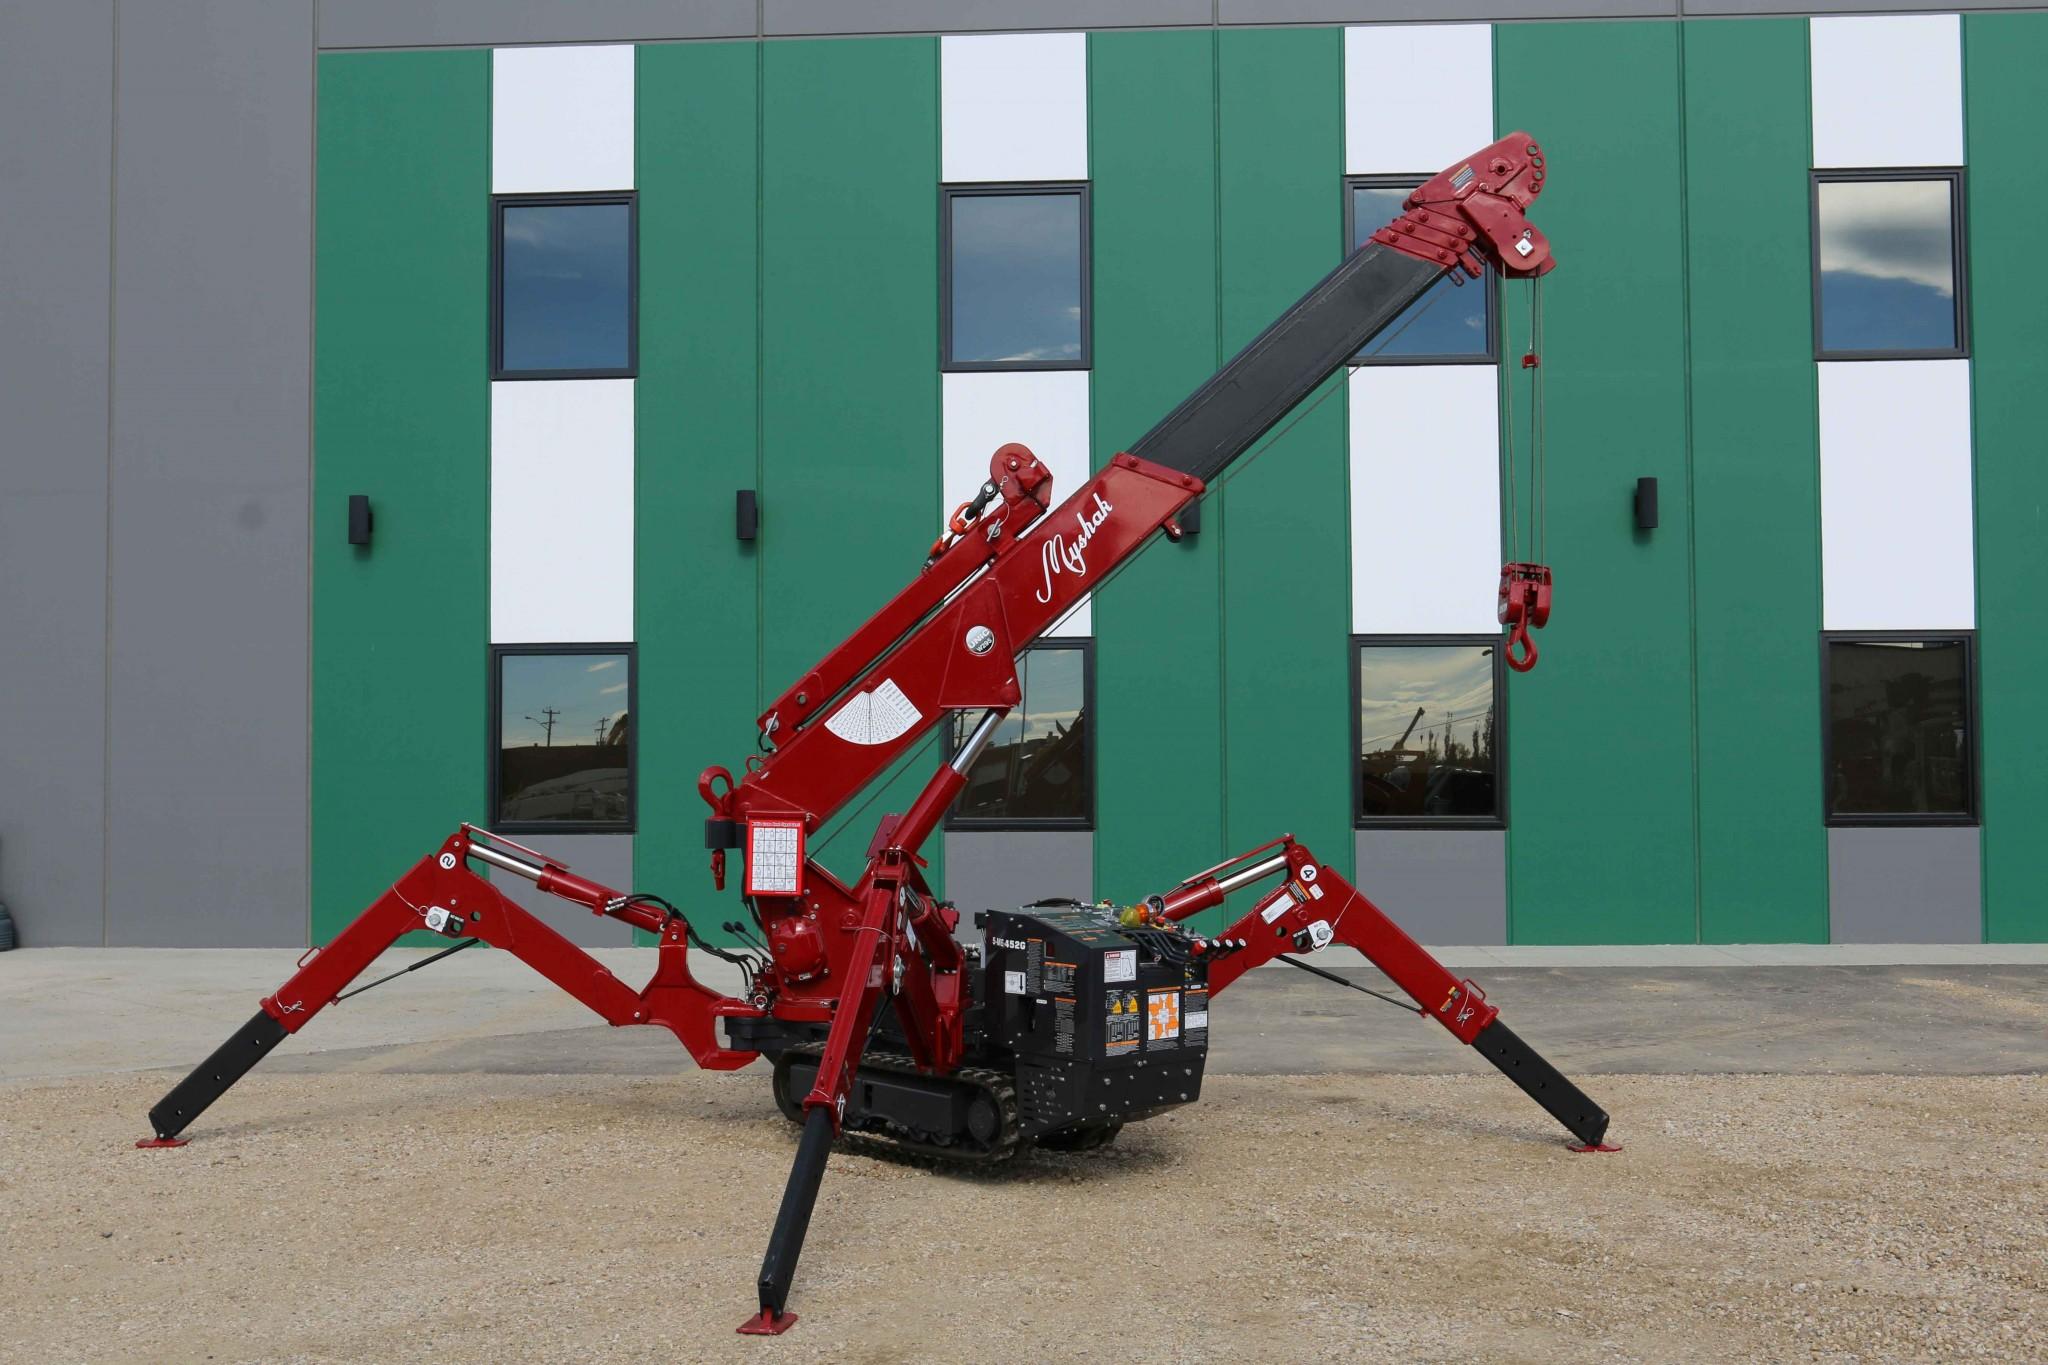 Unic Urw295 Spyder Crane Myshak Sales Amp Rentals Ltd